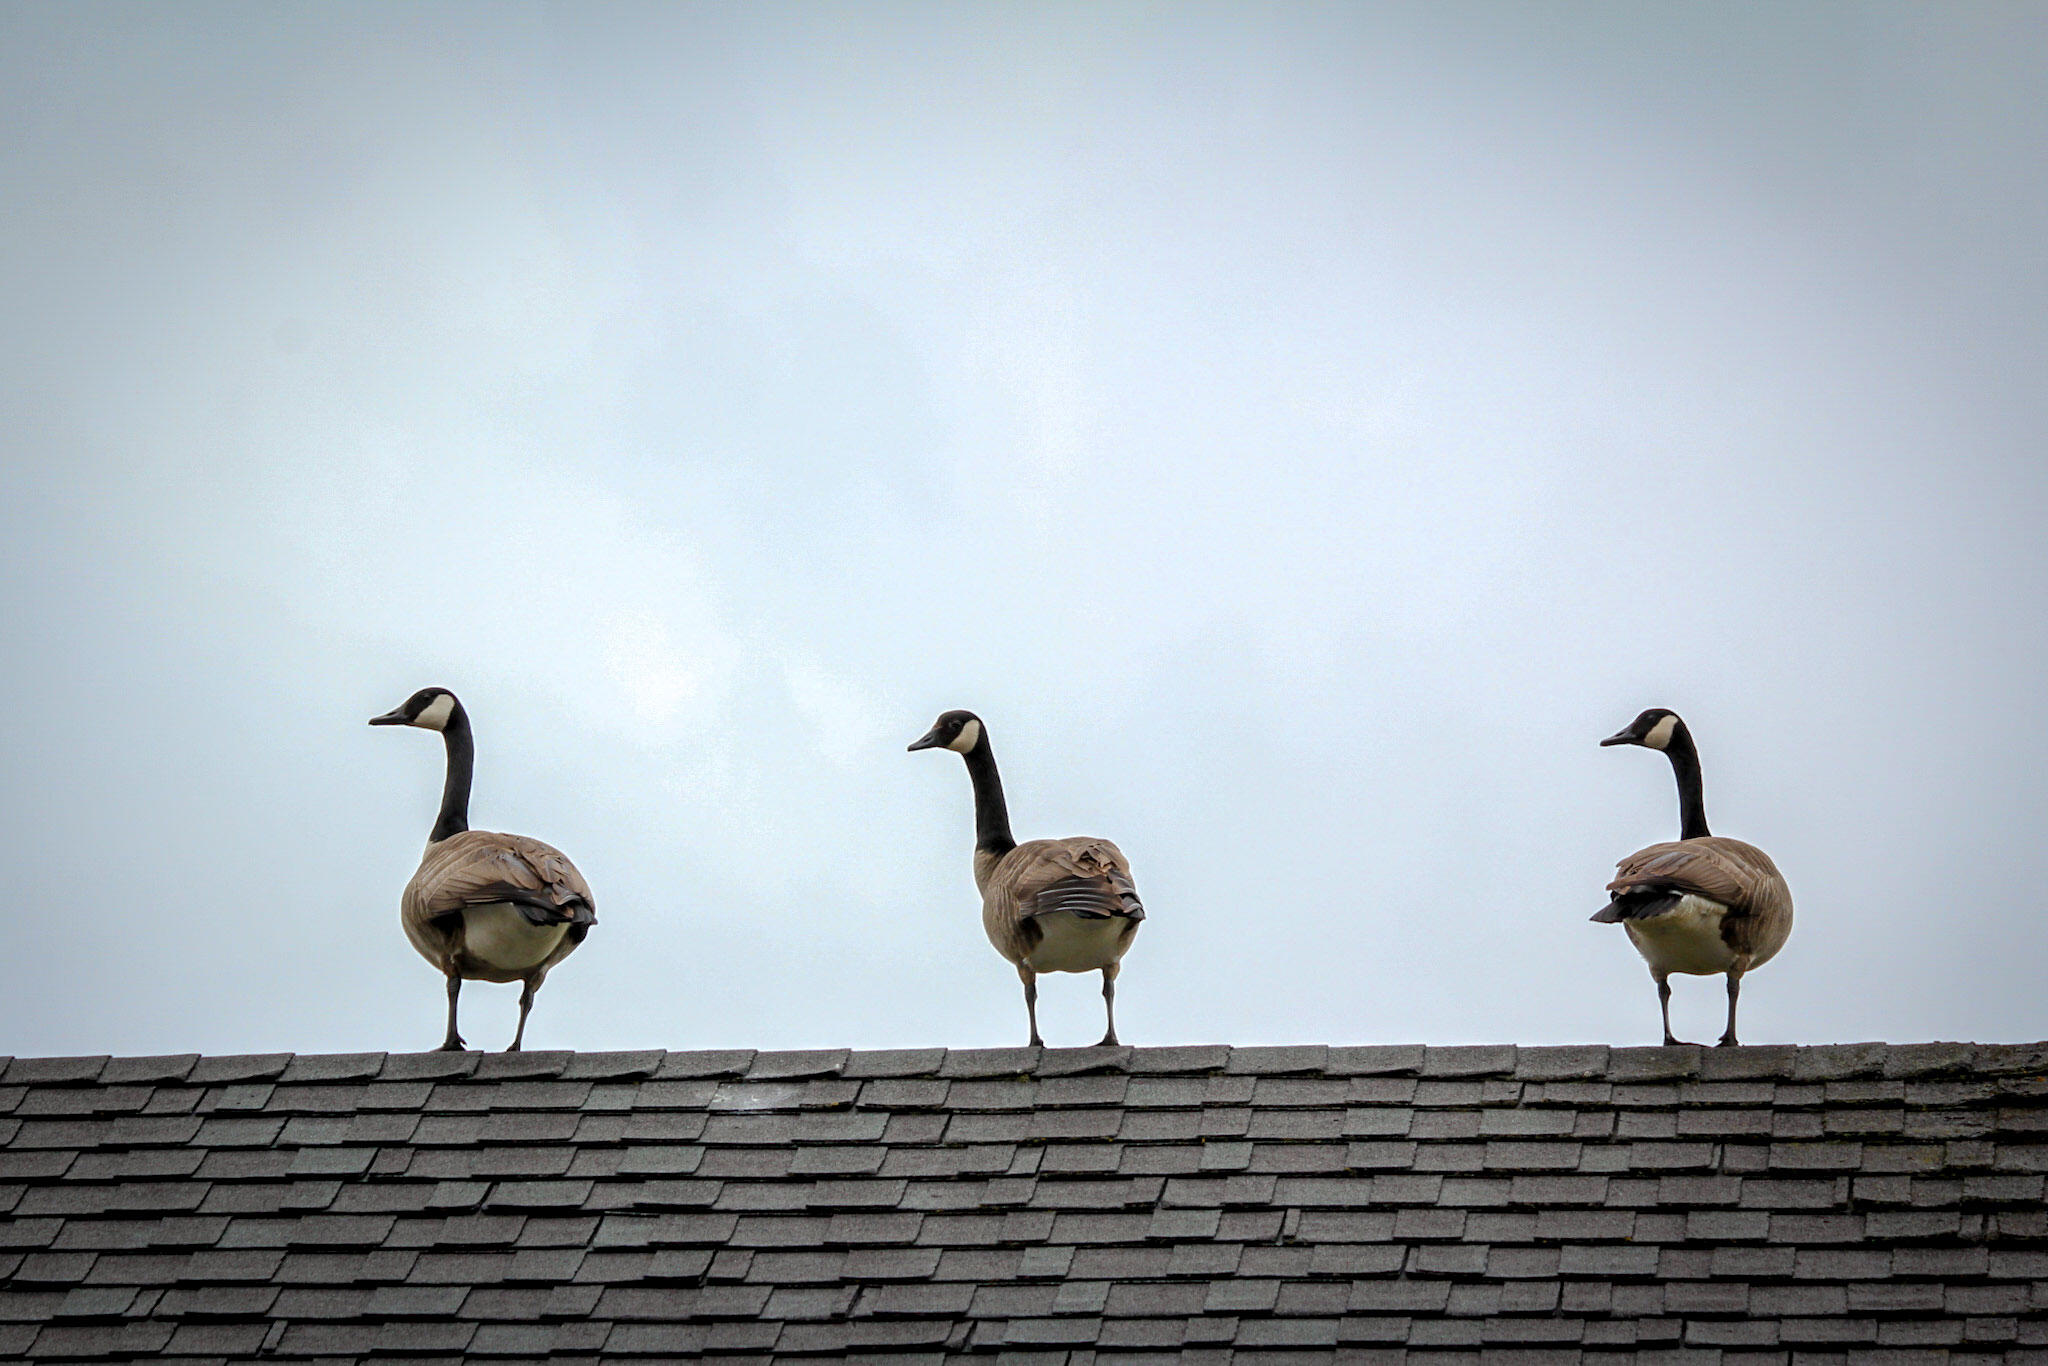 Canada Geese. Anne-Marie Wiggins, Caledon East, Ontario, Canada